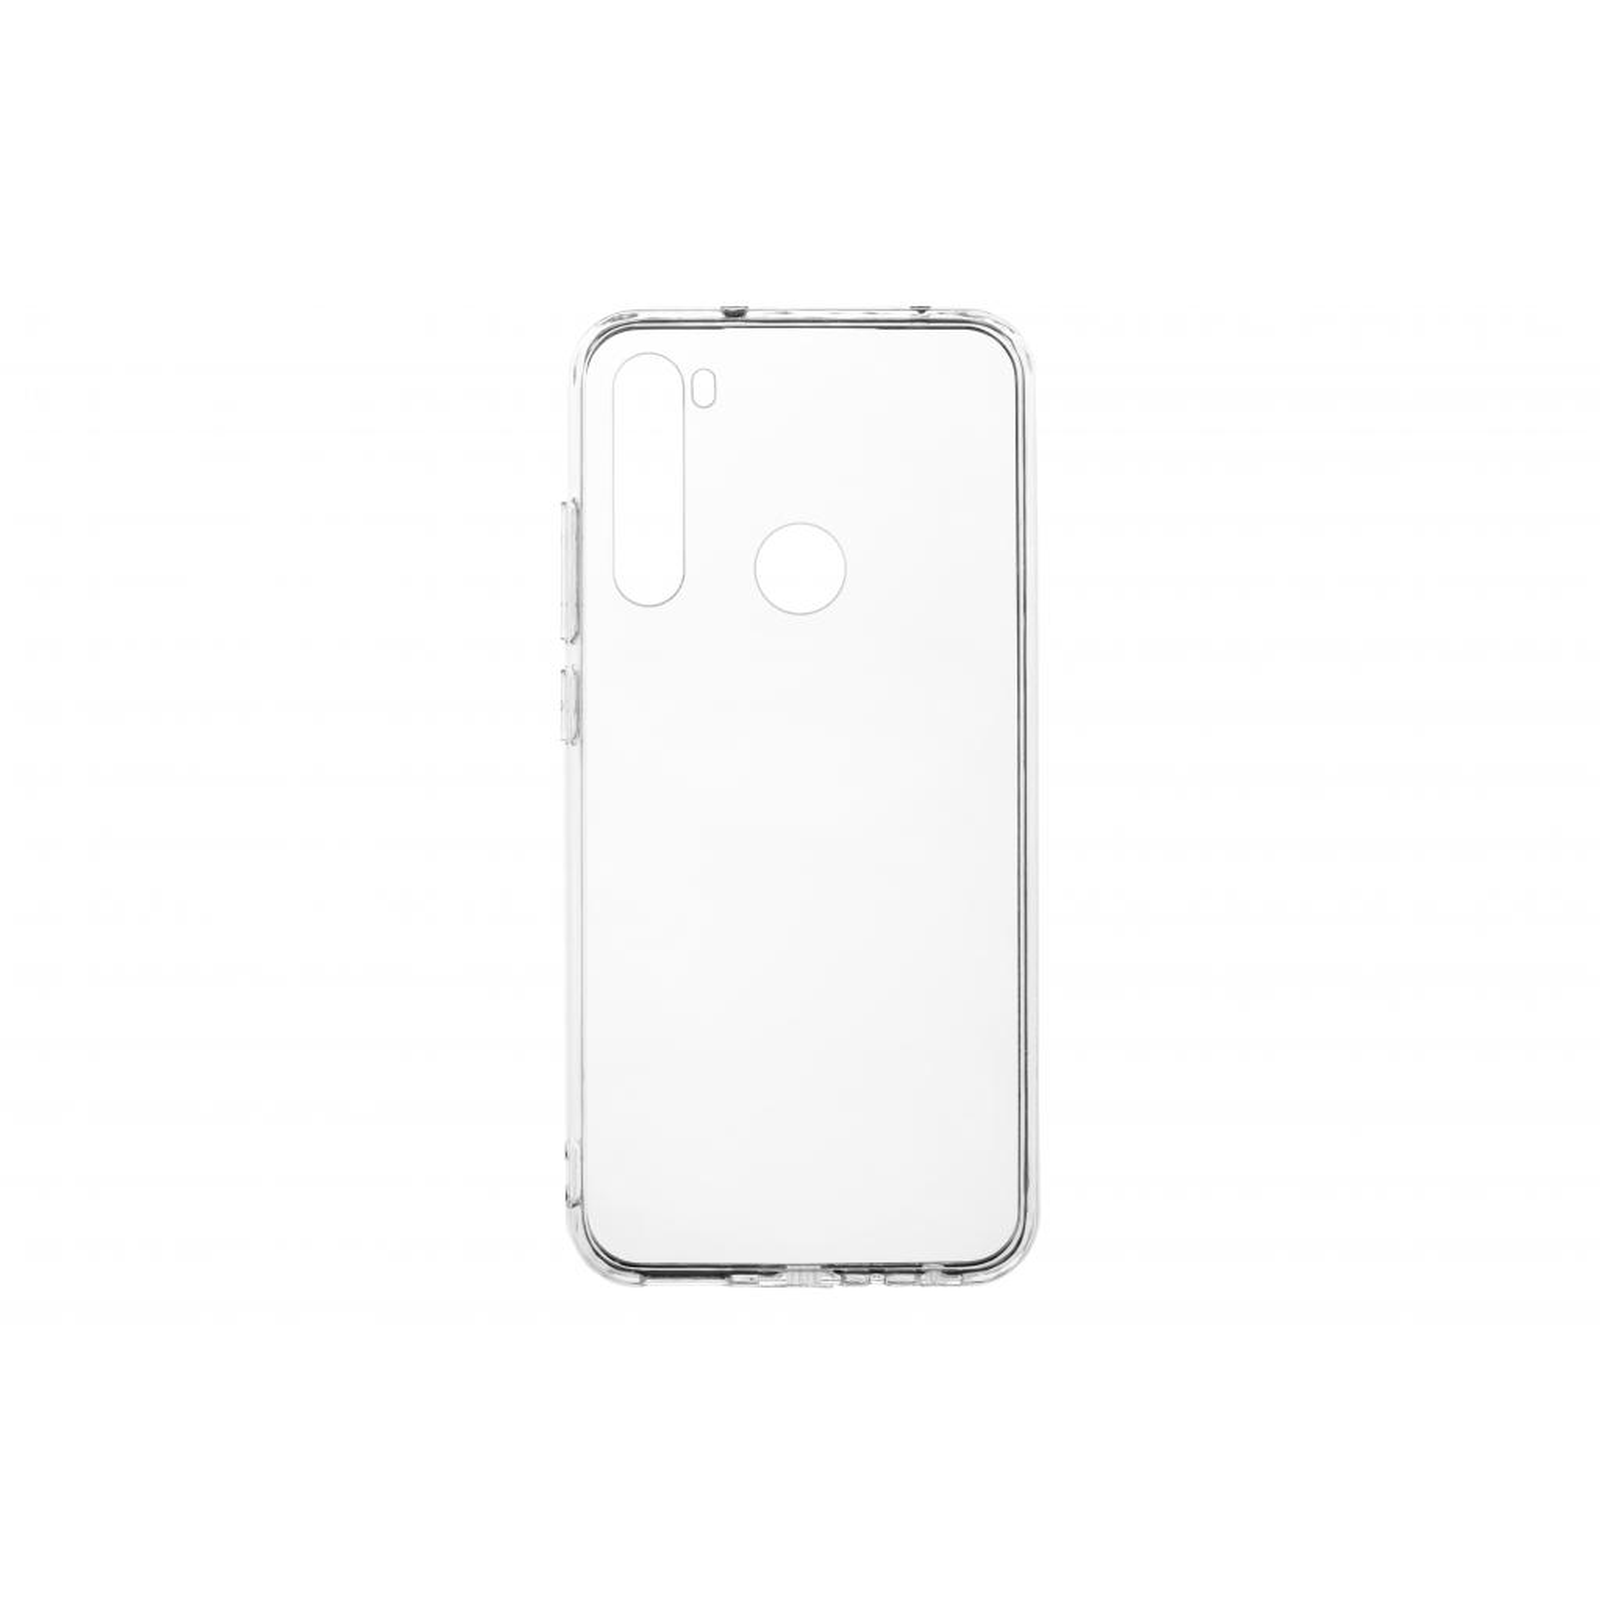 Чехол для моб. телефона 2E Xiaomi Redmi Note 8, Hybrid, Transparent (2E-MI-N8-AOHB-TR)